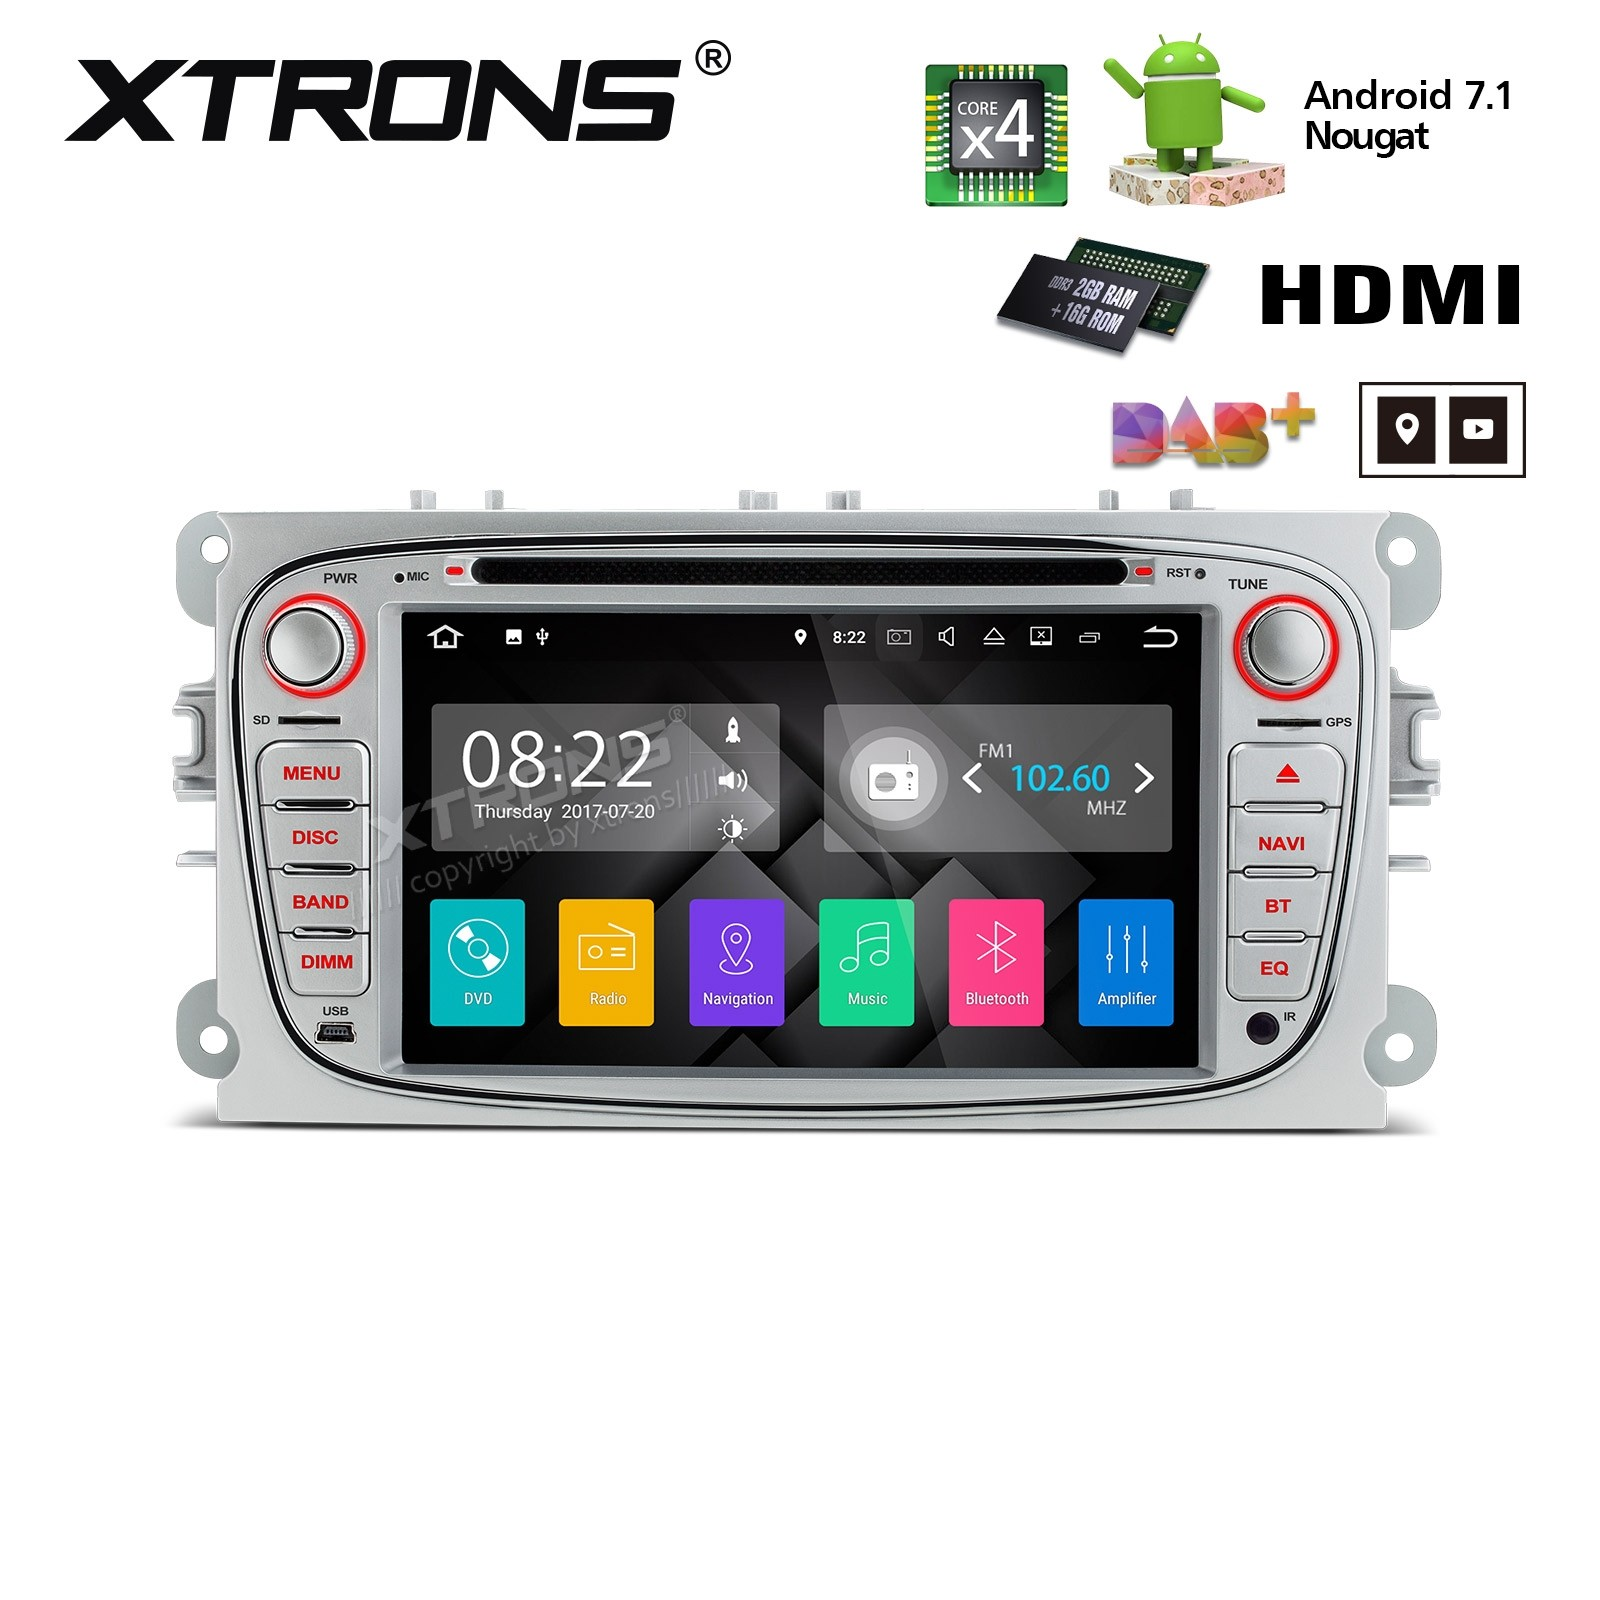 XTRONS PA77FSFP-S